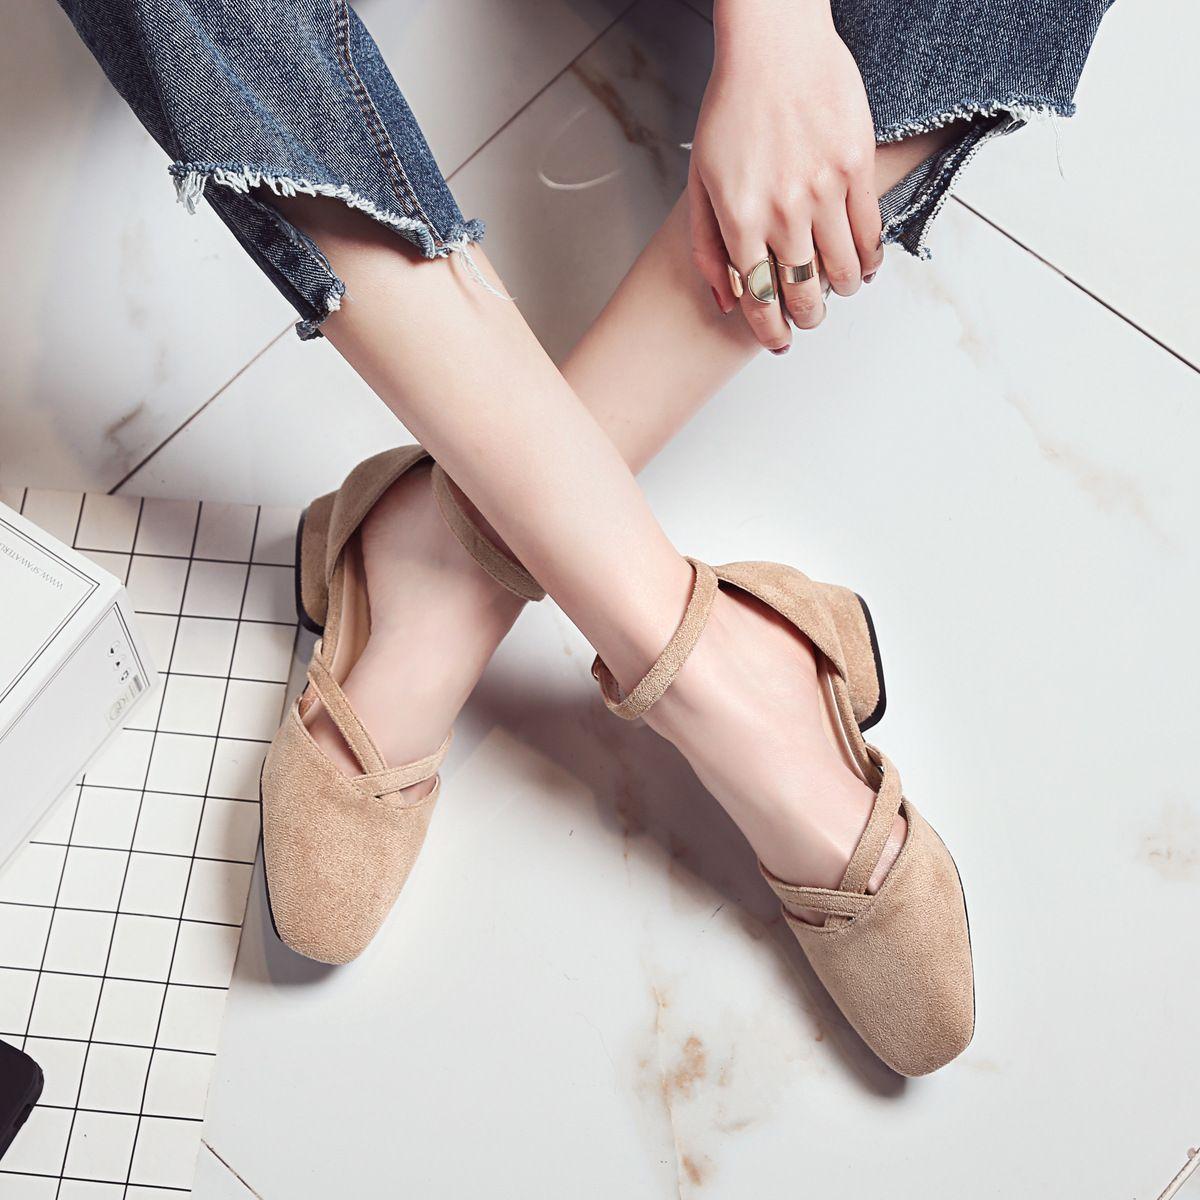 da73c3a37ec Dress Shoes 2019 Spring Summer Women Ankle Strap Low Heels Faux Suede Woman  Dress Cross-tied Pumps Zapatos Mujeriok9